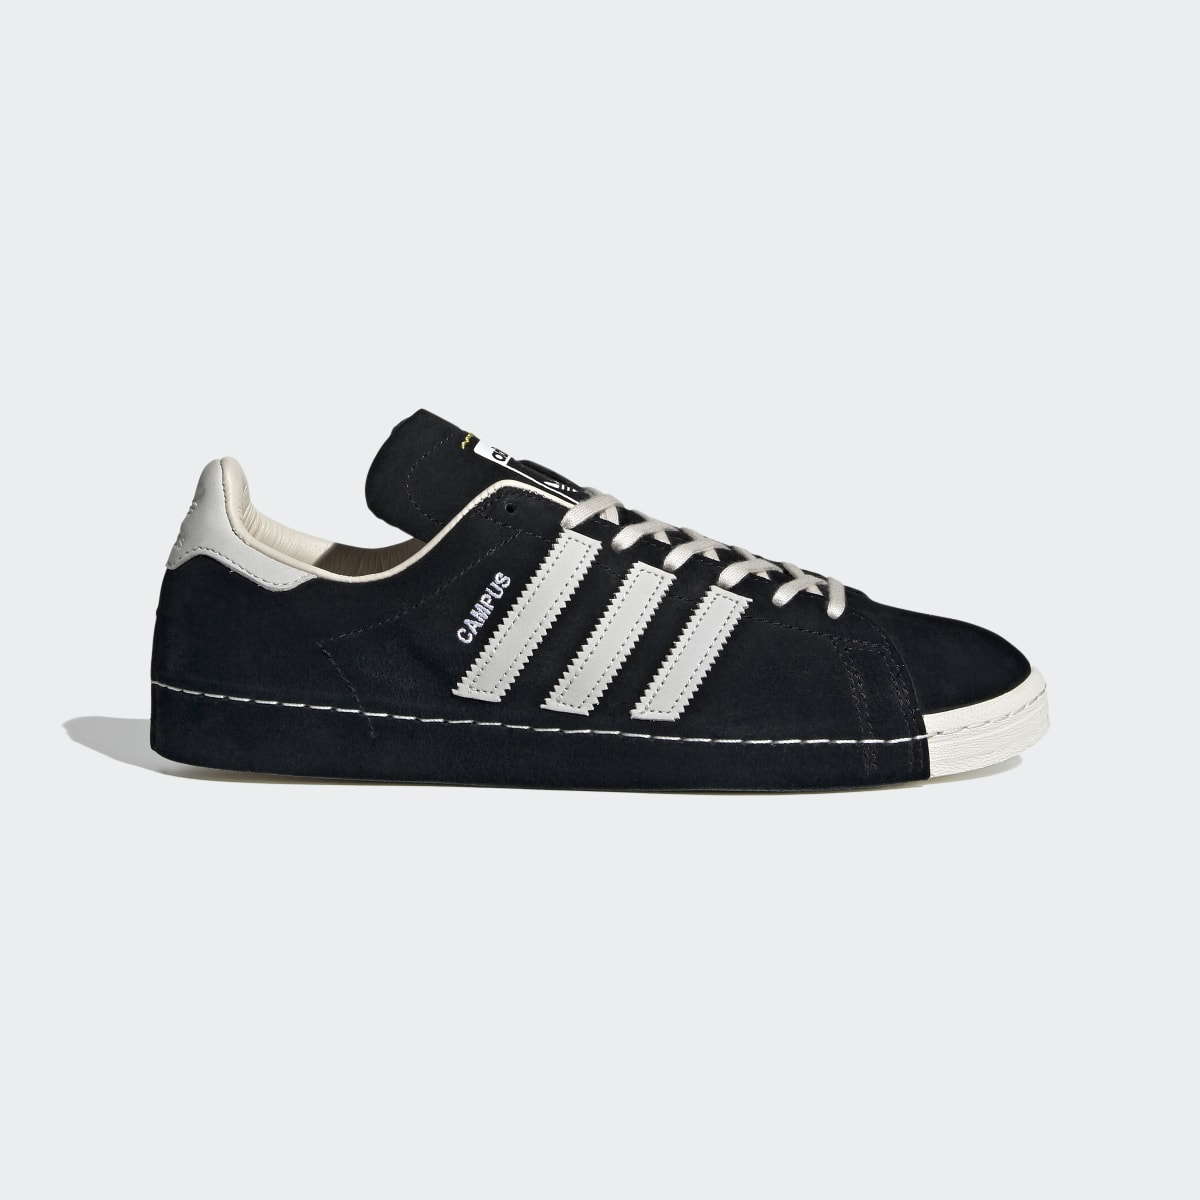 Campus 80s Shoes